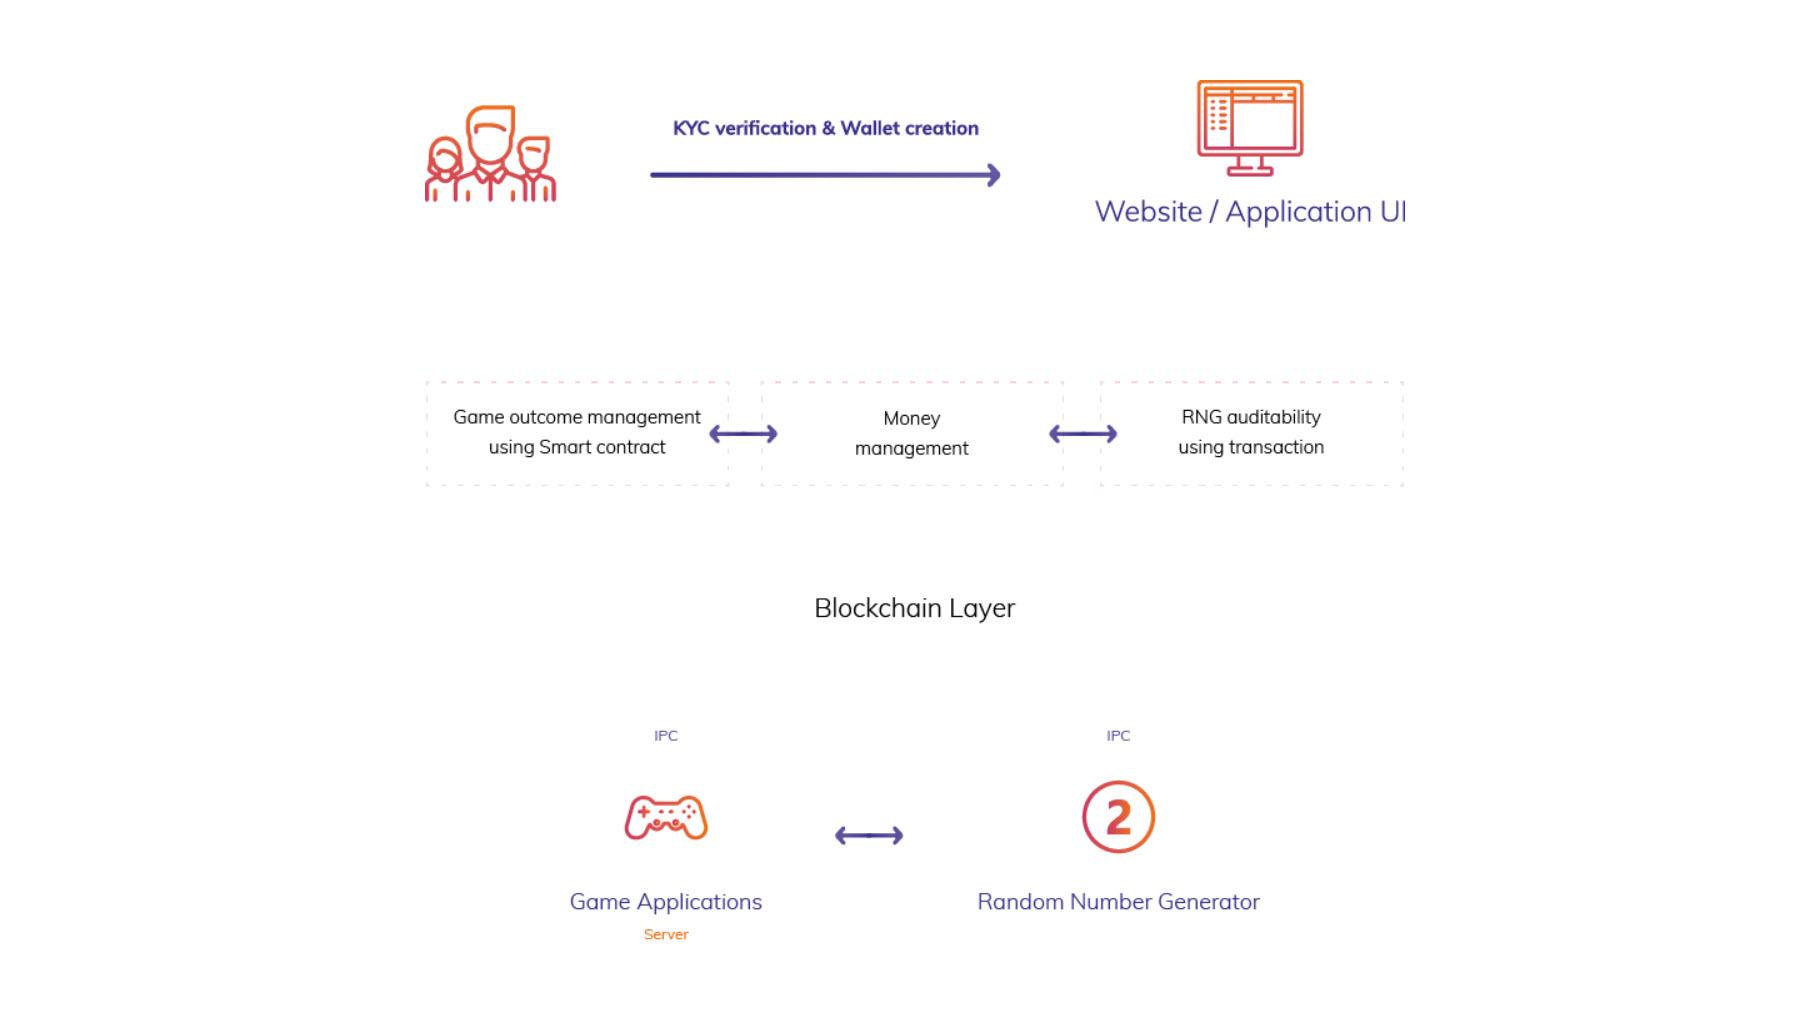 Joytoken Ico Live Random Number Generator Based Game Blockchain Layer Interlayer A Gaming Platform